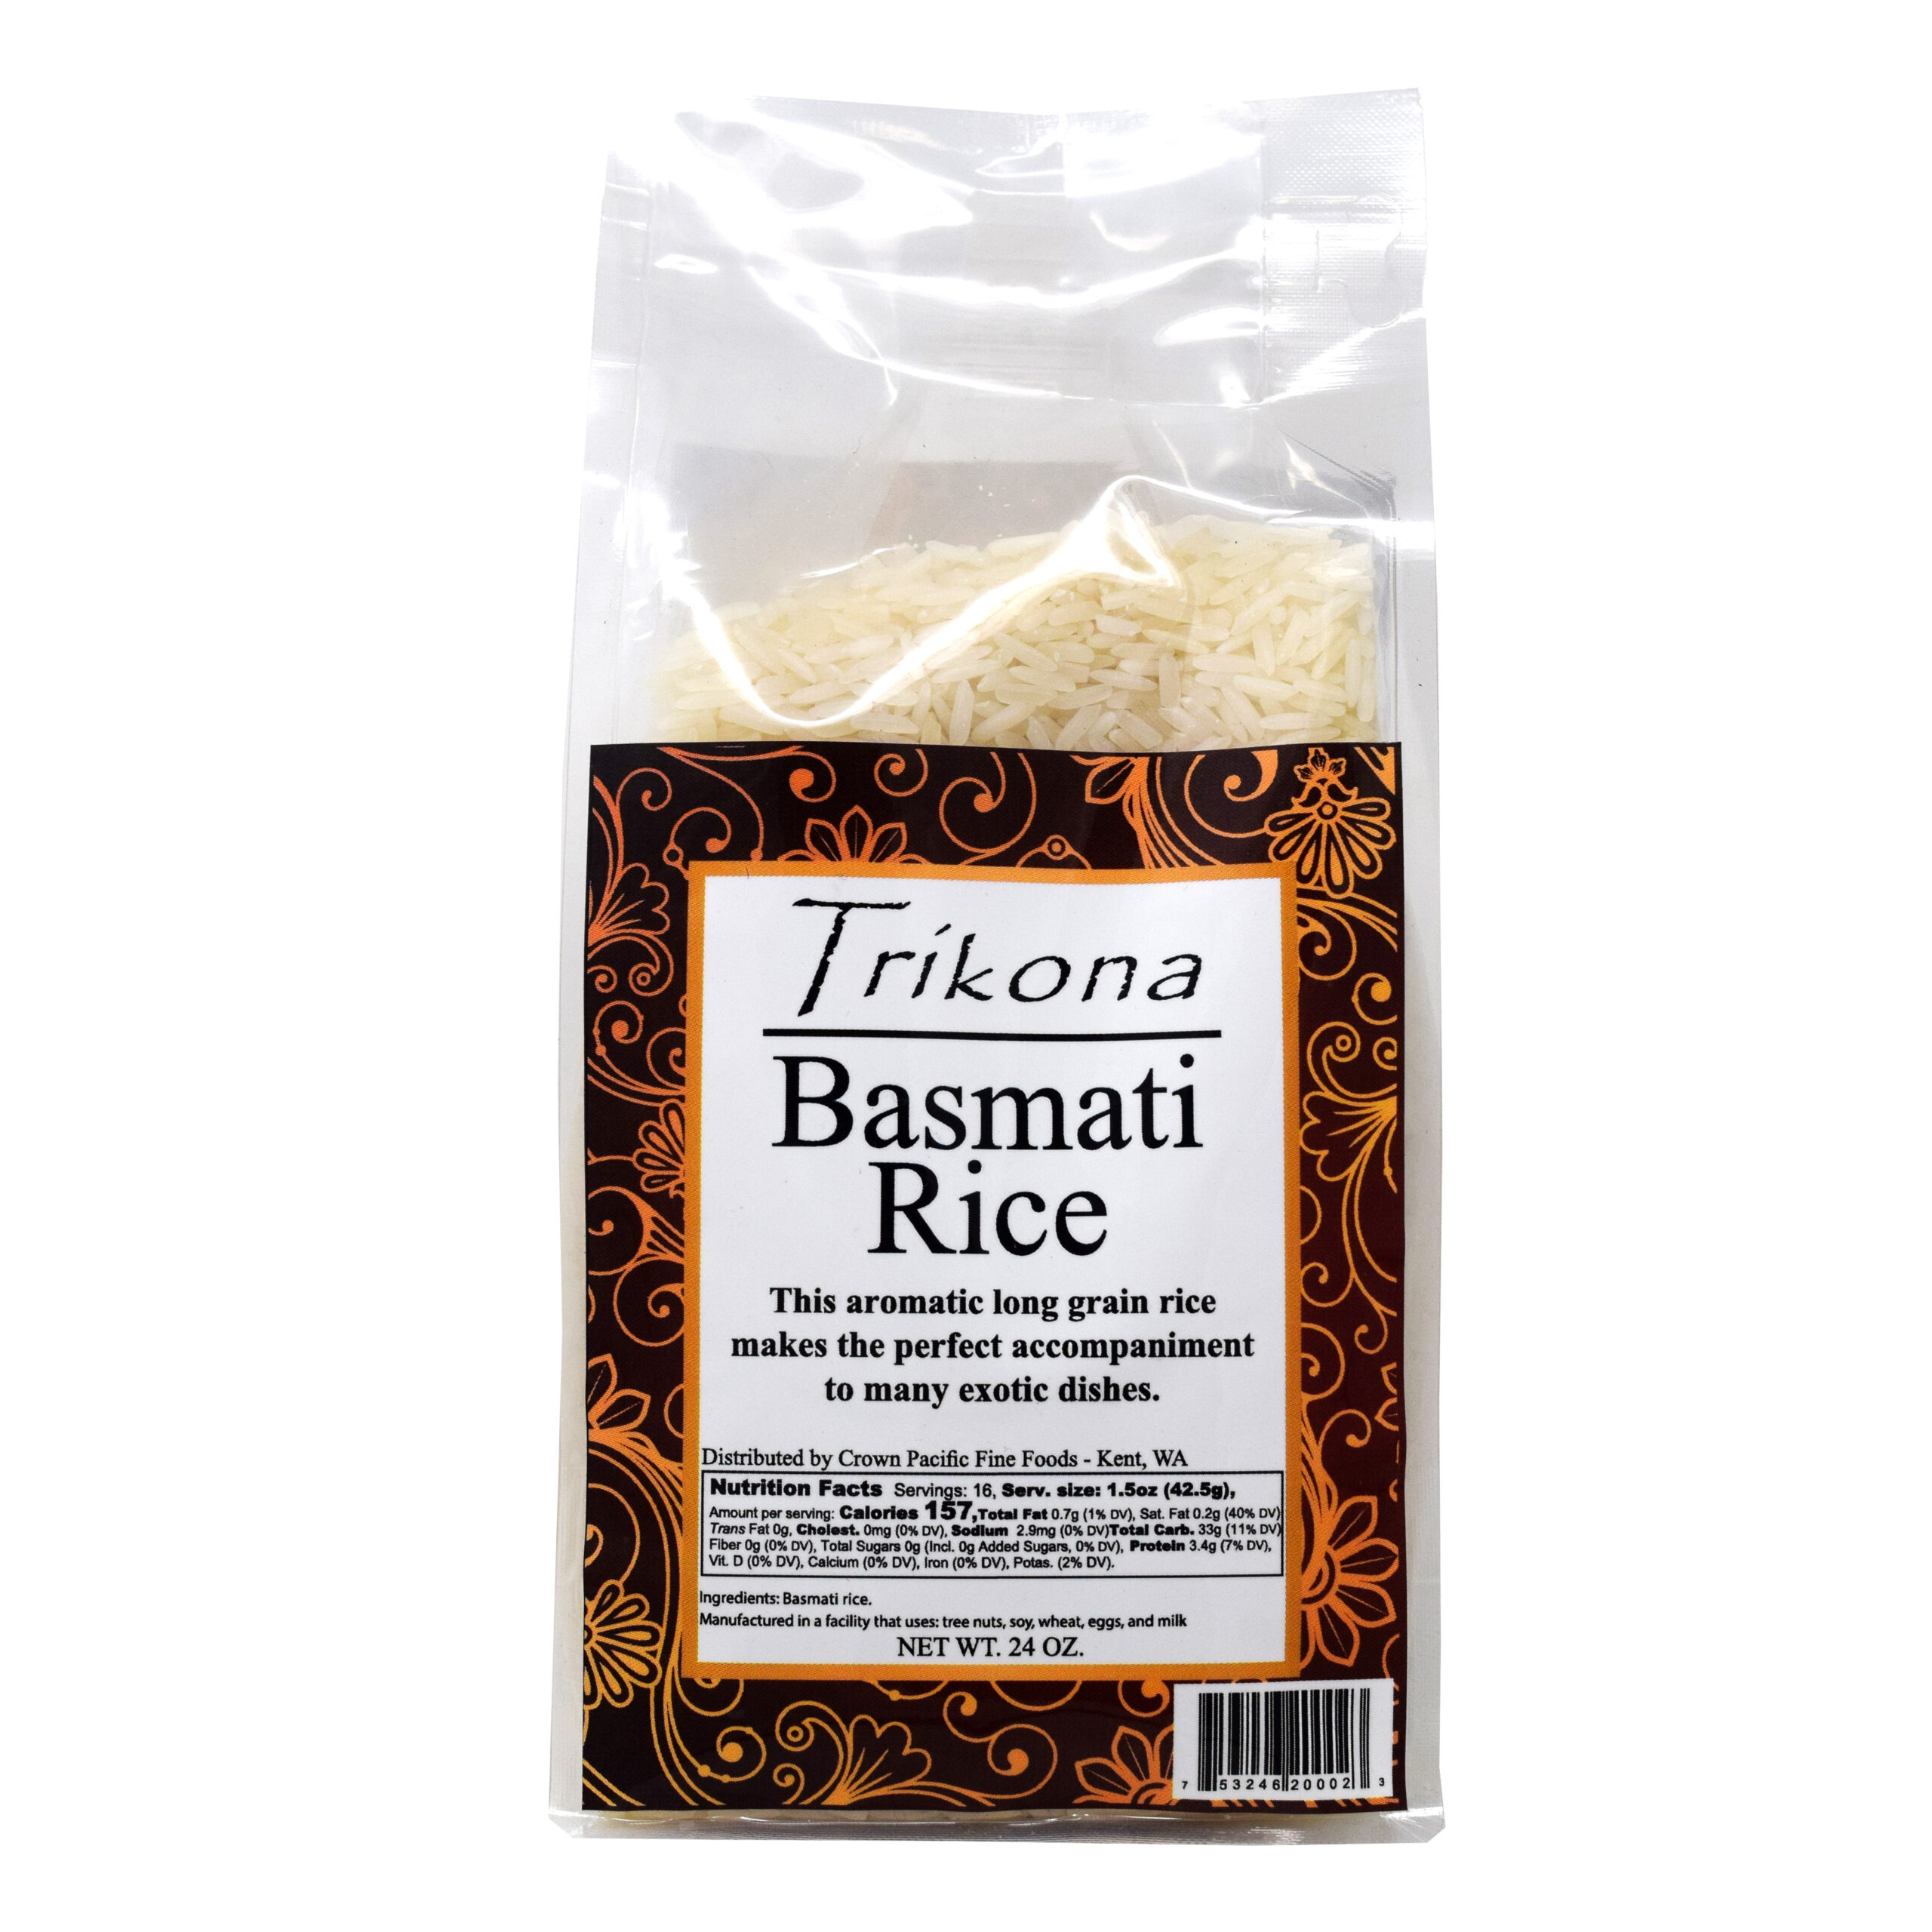 Trikona Basmati Rice